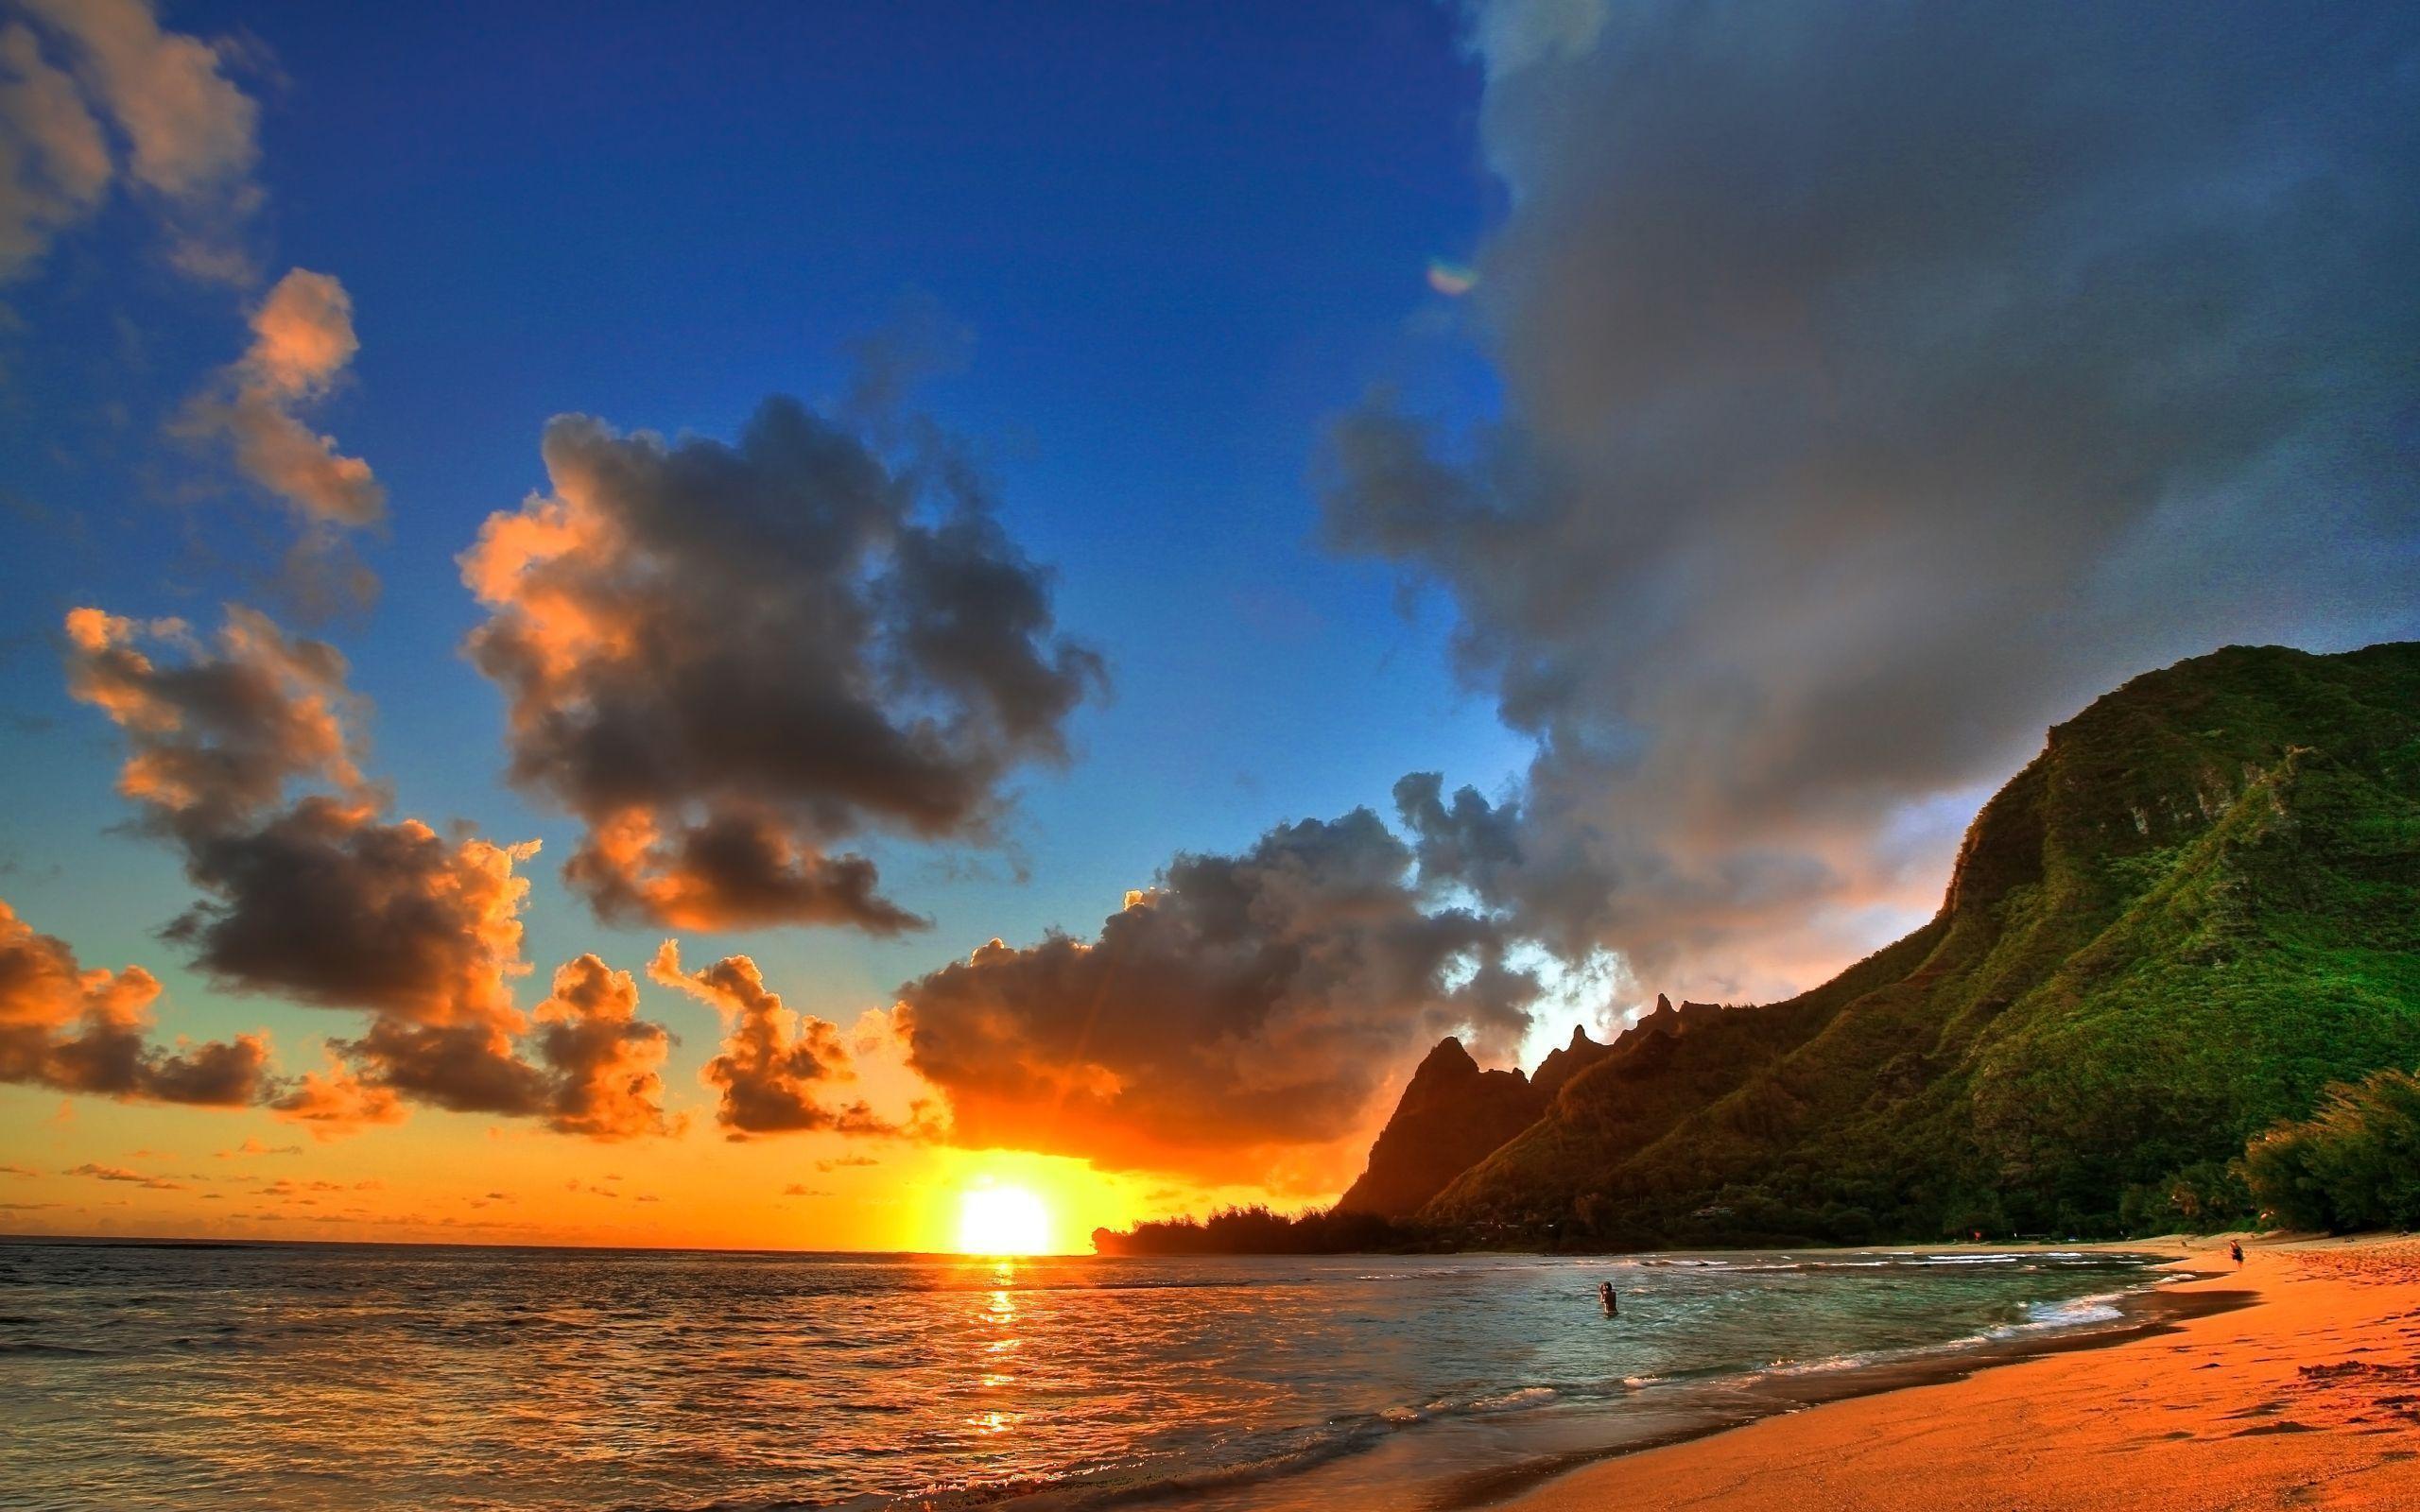 Hawaii Sunset Wallpapers 2560x1600